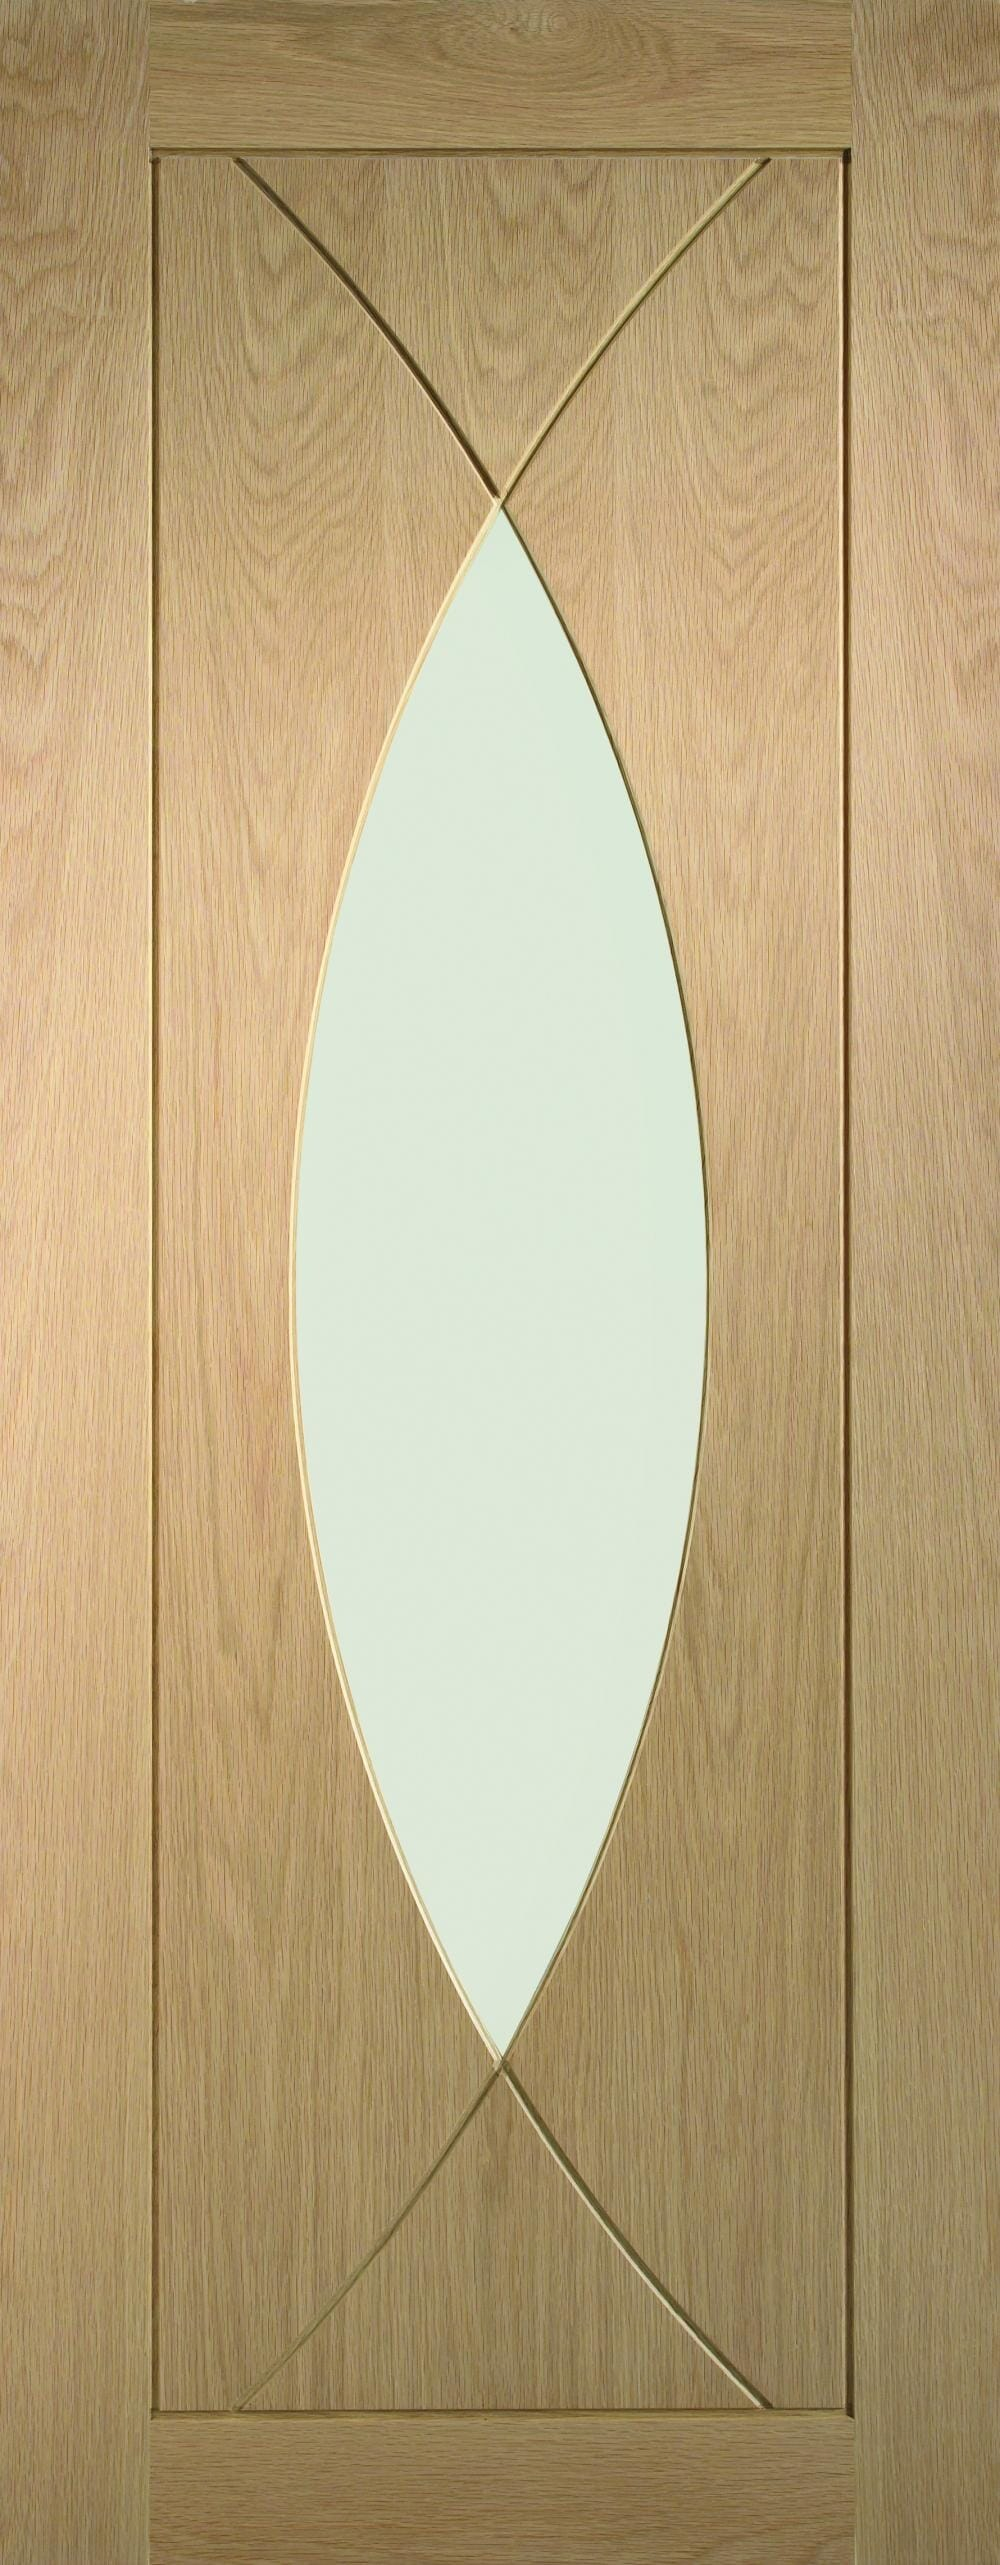 Pesaro Oak - Clear Glass Image